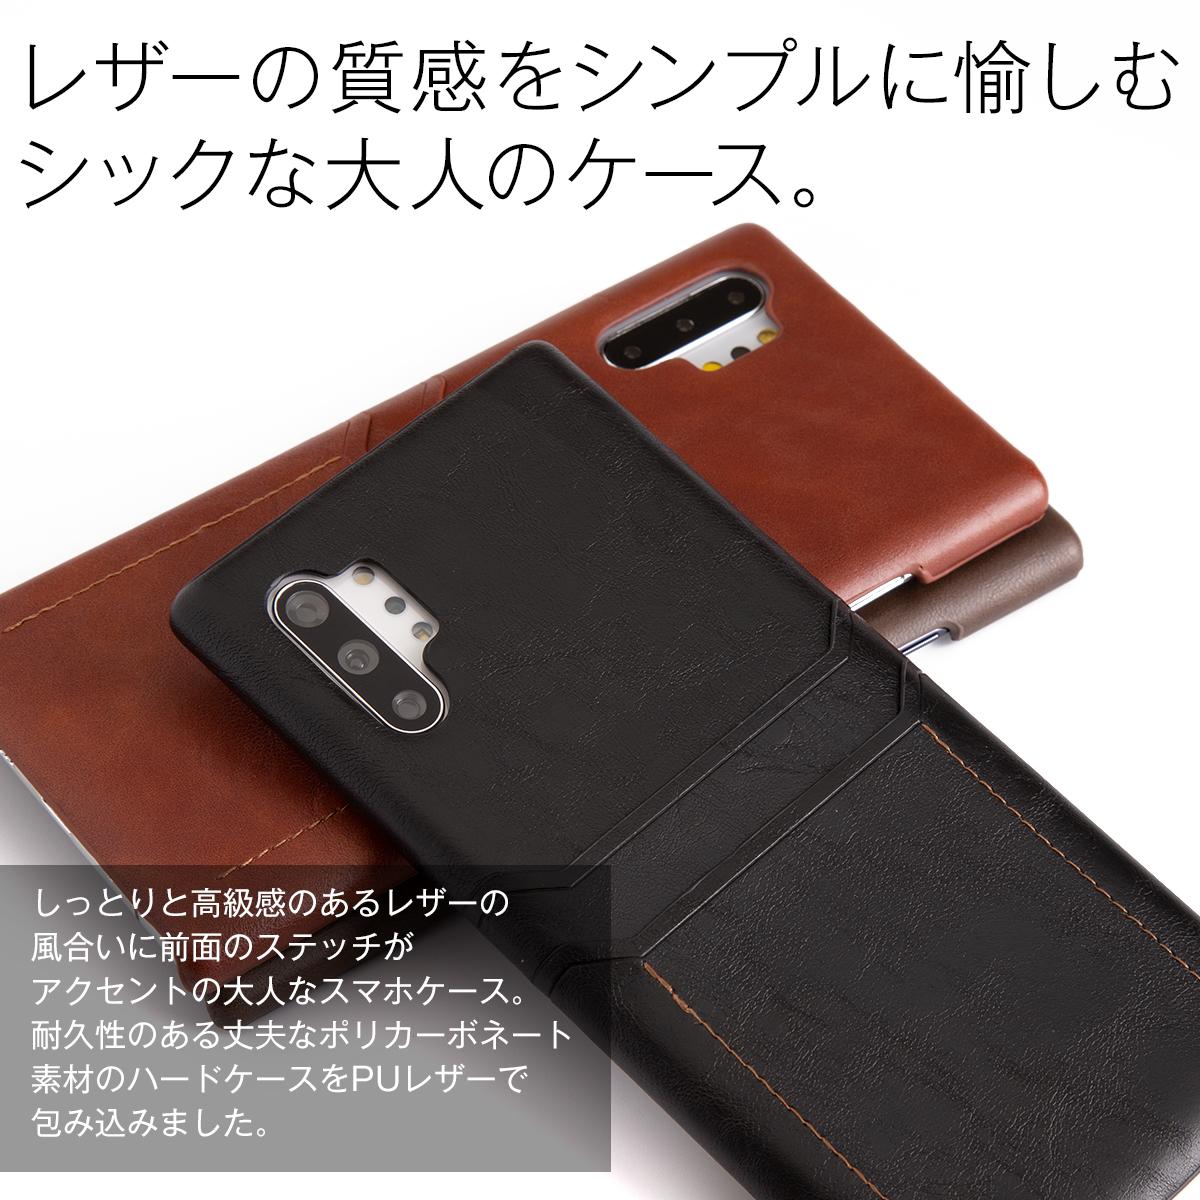 Galaxy Note10+ SC-01M SCV45 カードポケット付きハードケース